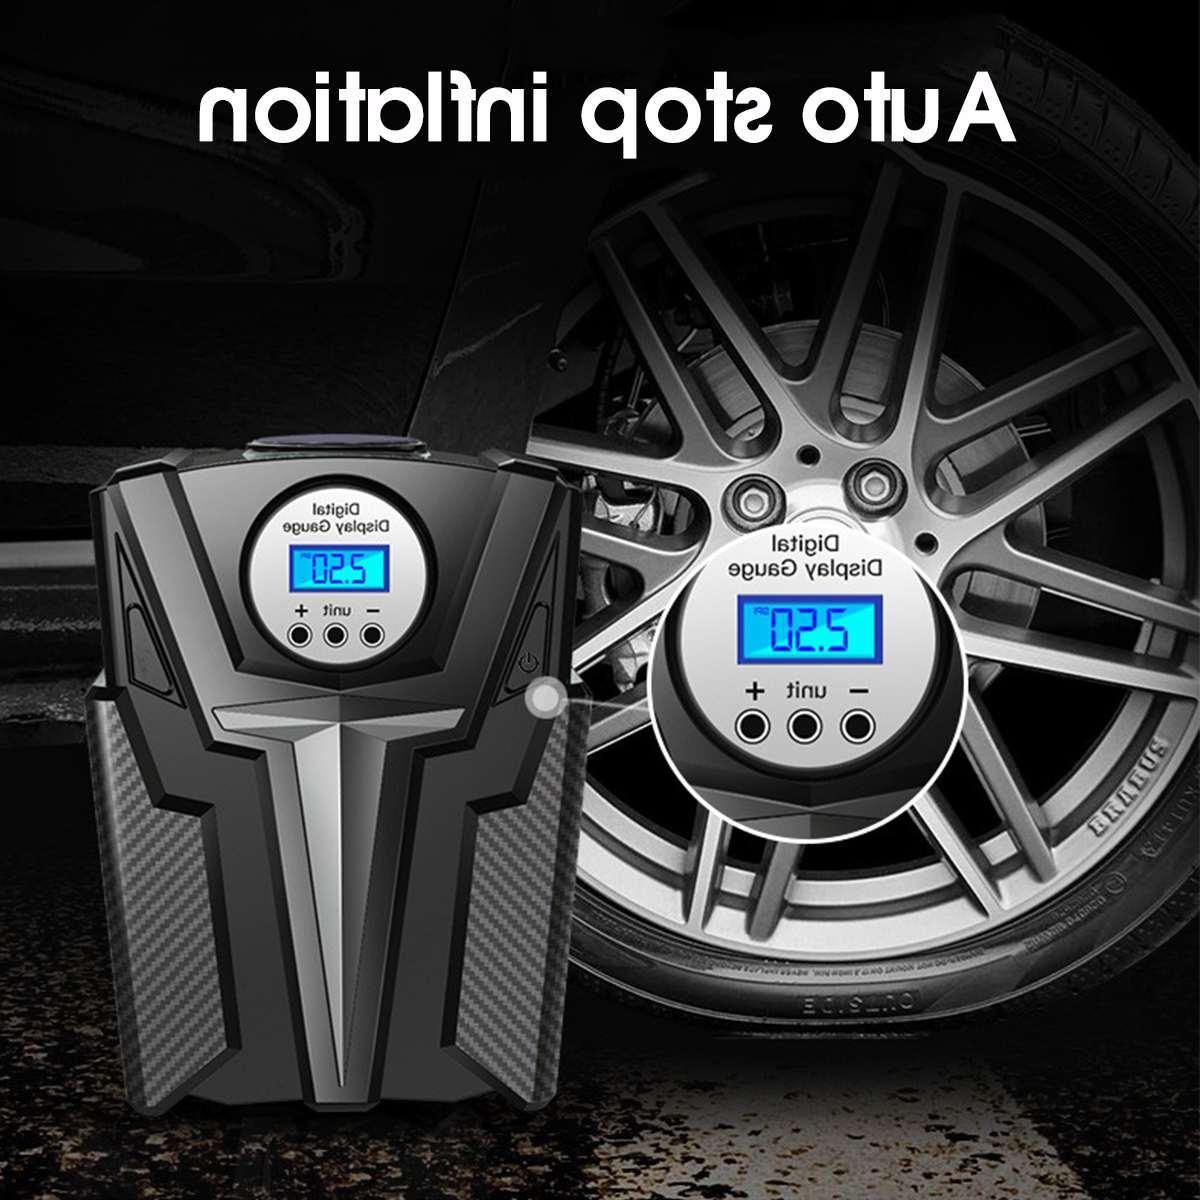 New Inflator Pump DC 12 Volt Car Portable <font><b>Air</b></font> Pump 150 Aire for Motorcycle LED Light